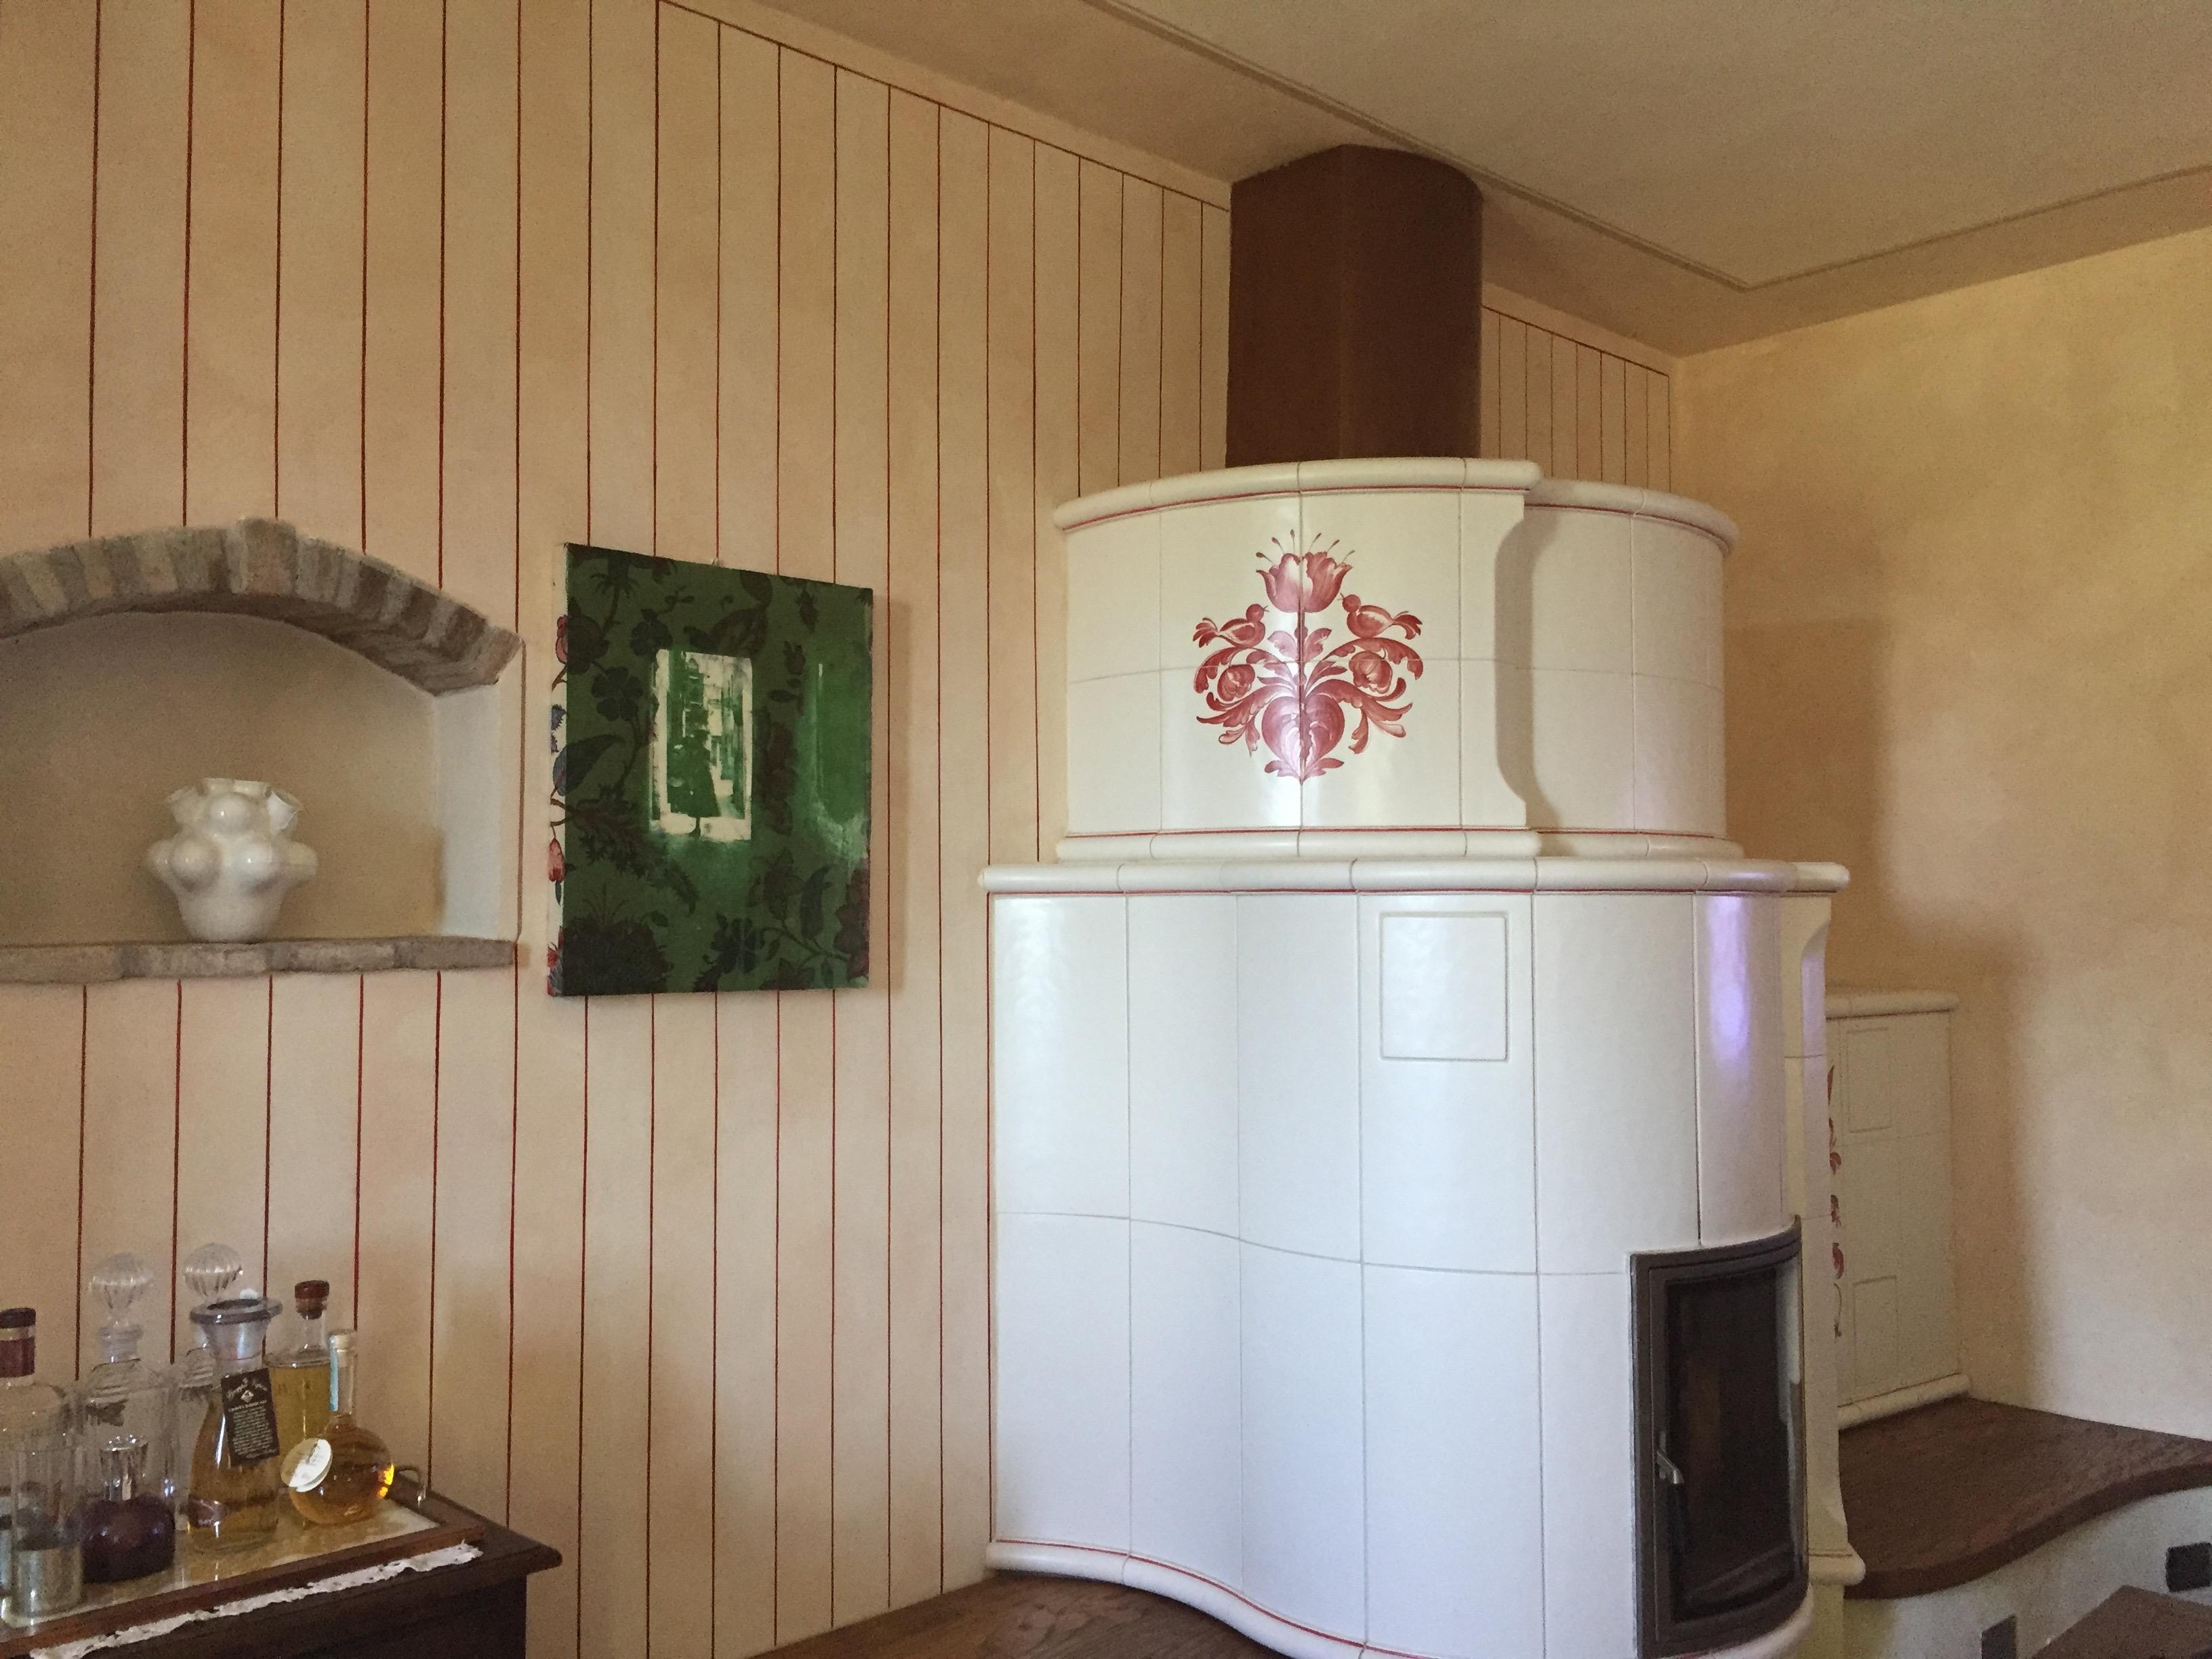 Decoratore d interni finiture dinterni with decoratore d interni gallery of arredamento pareti - Decoratore d interni ...